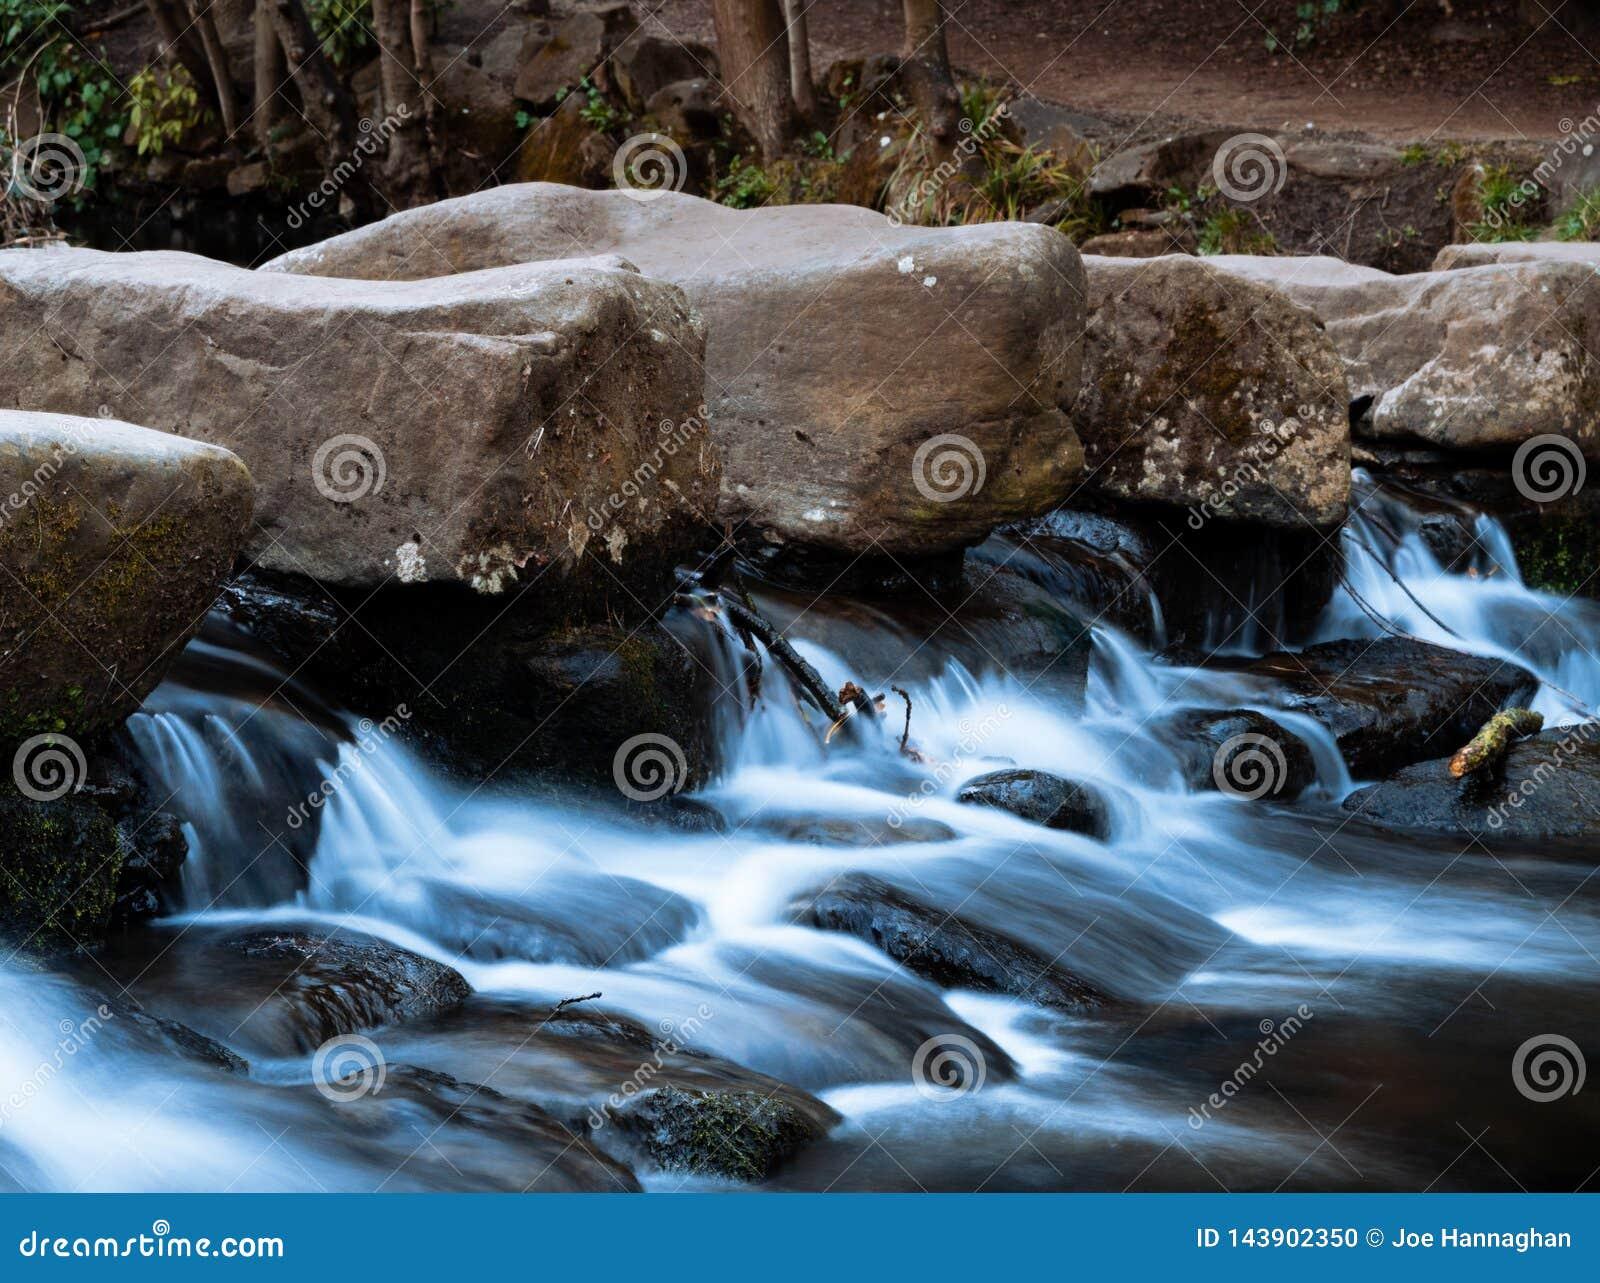 Misty River Waterfall in Park